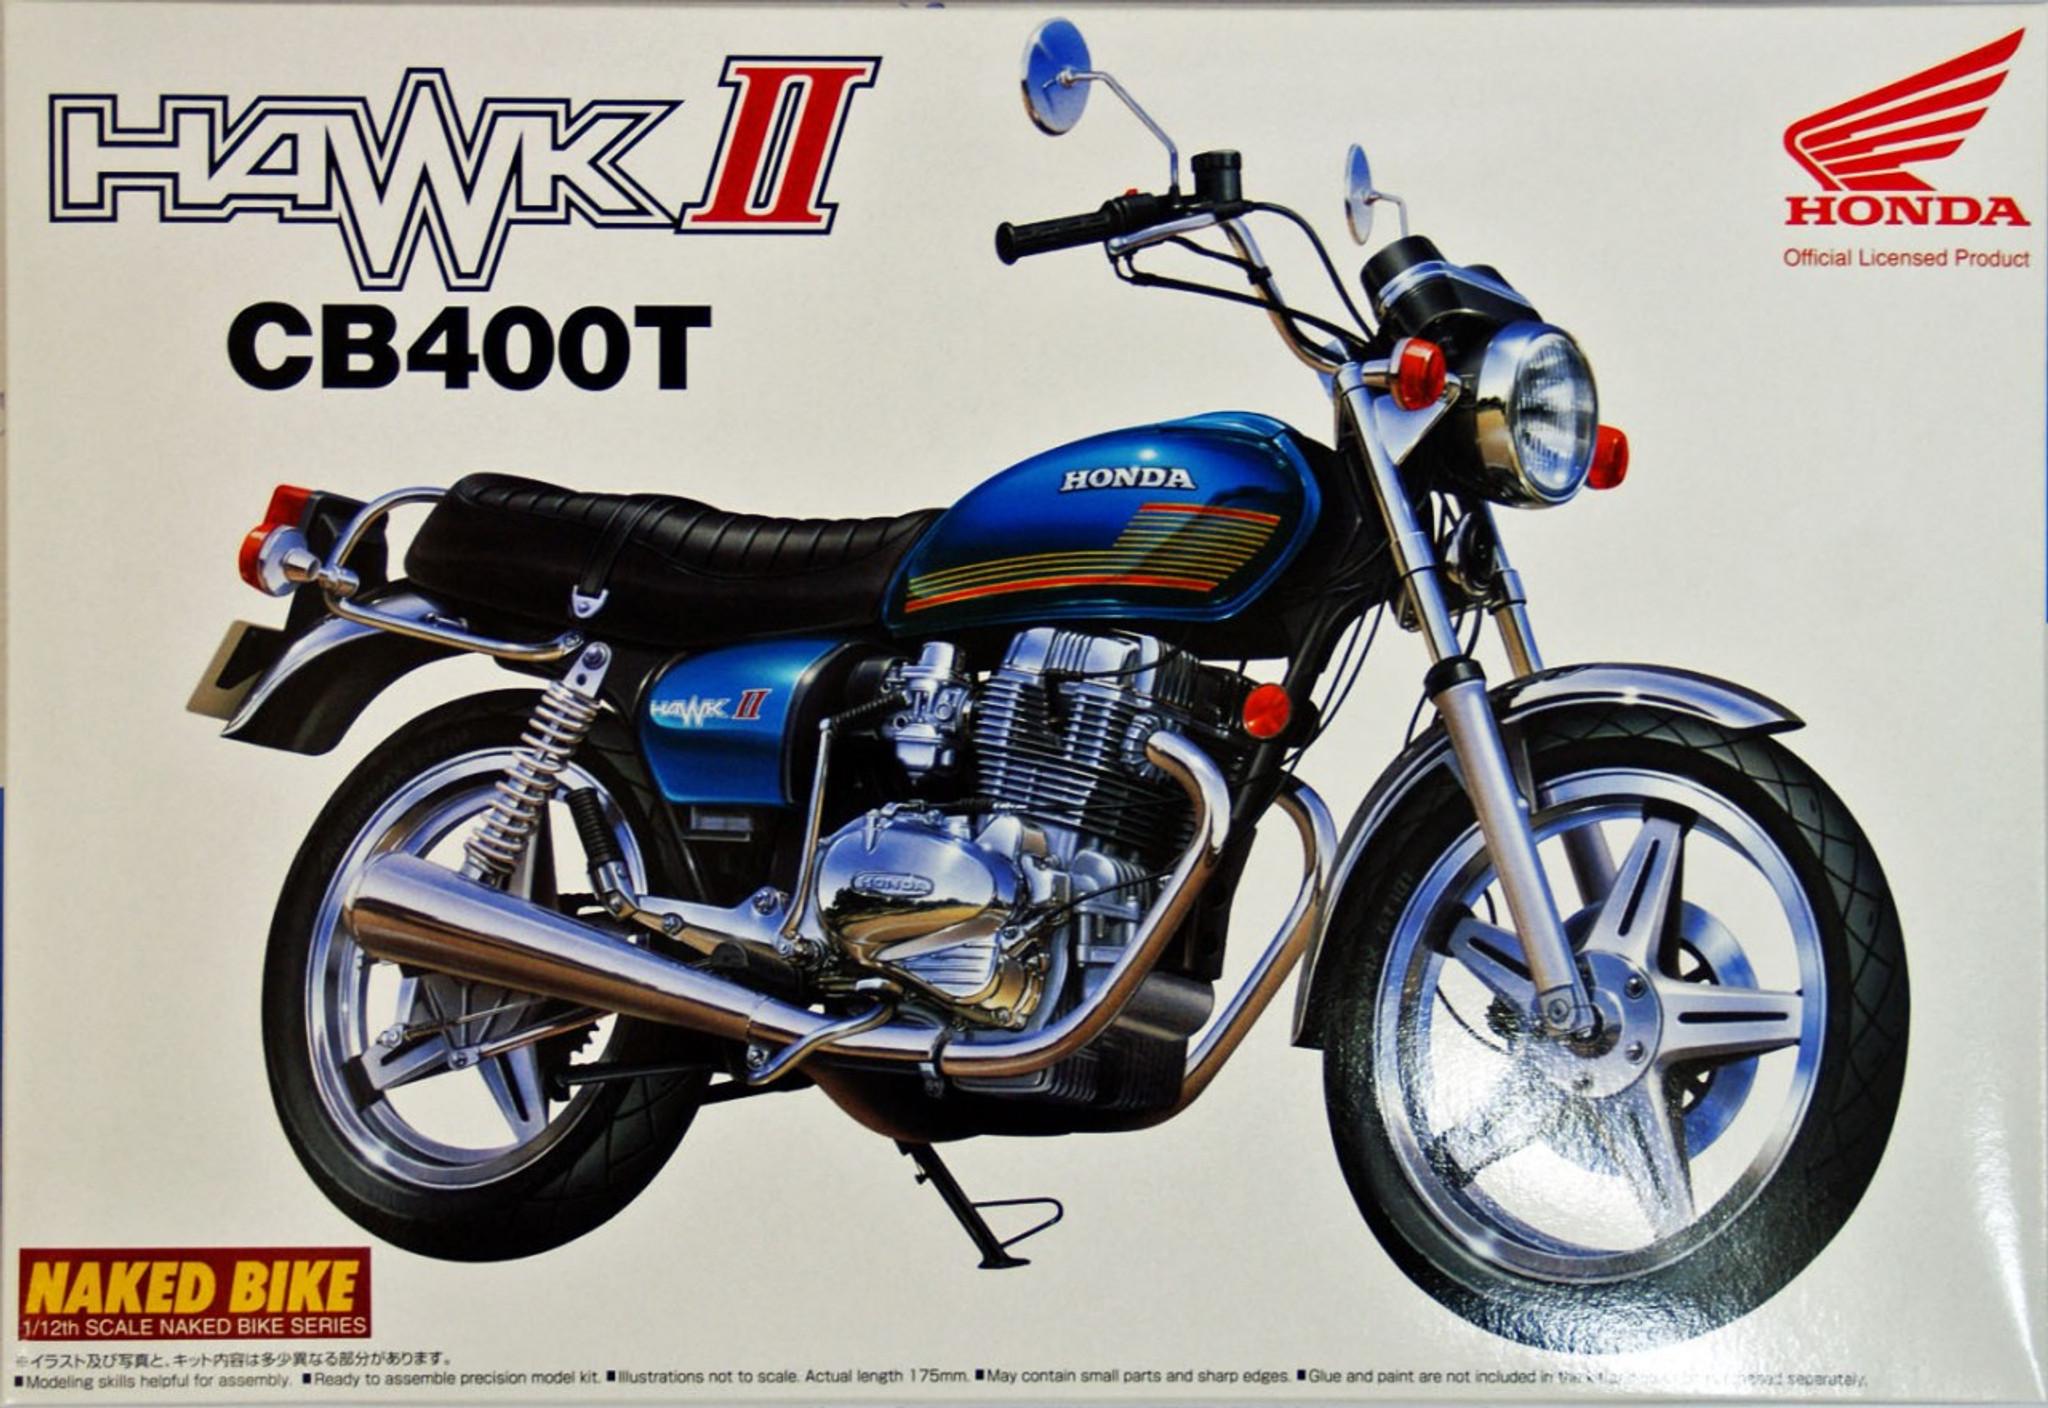 small resolution of aoshima naked bike 66 47002 honda hawk ii cb400t 1 12 scale kit plaza japan